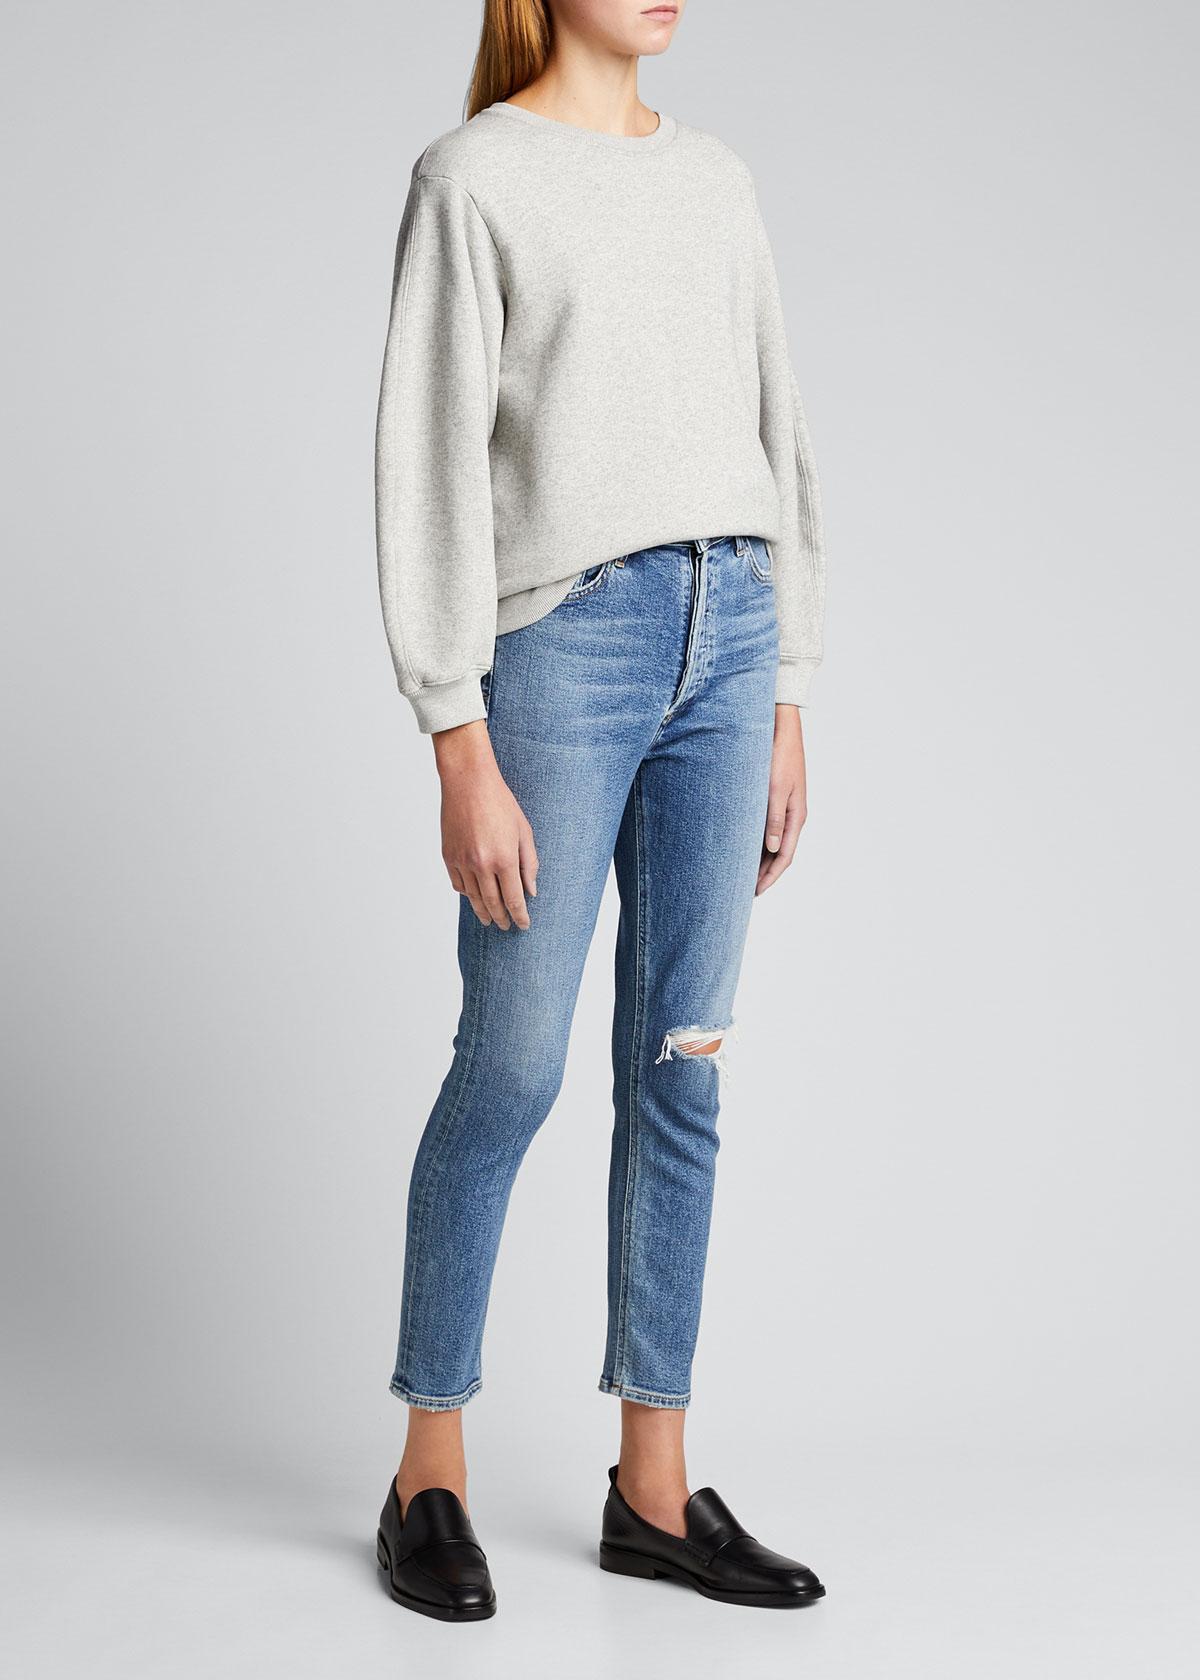 Agolde Sweatshirts THORA PUFF-SLEEVE SWEATSHIRT